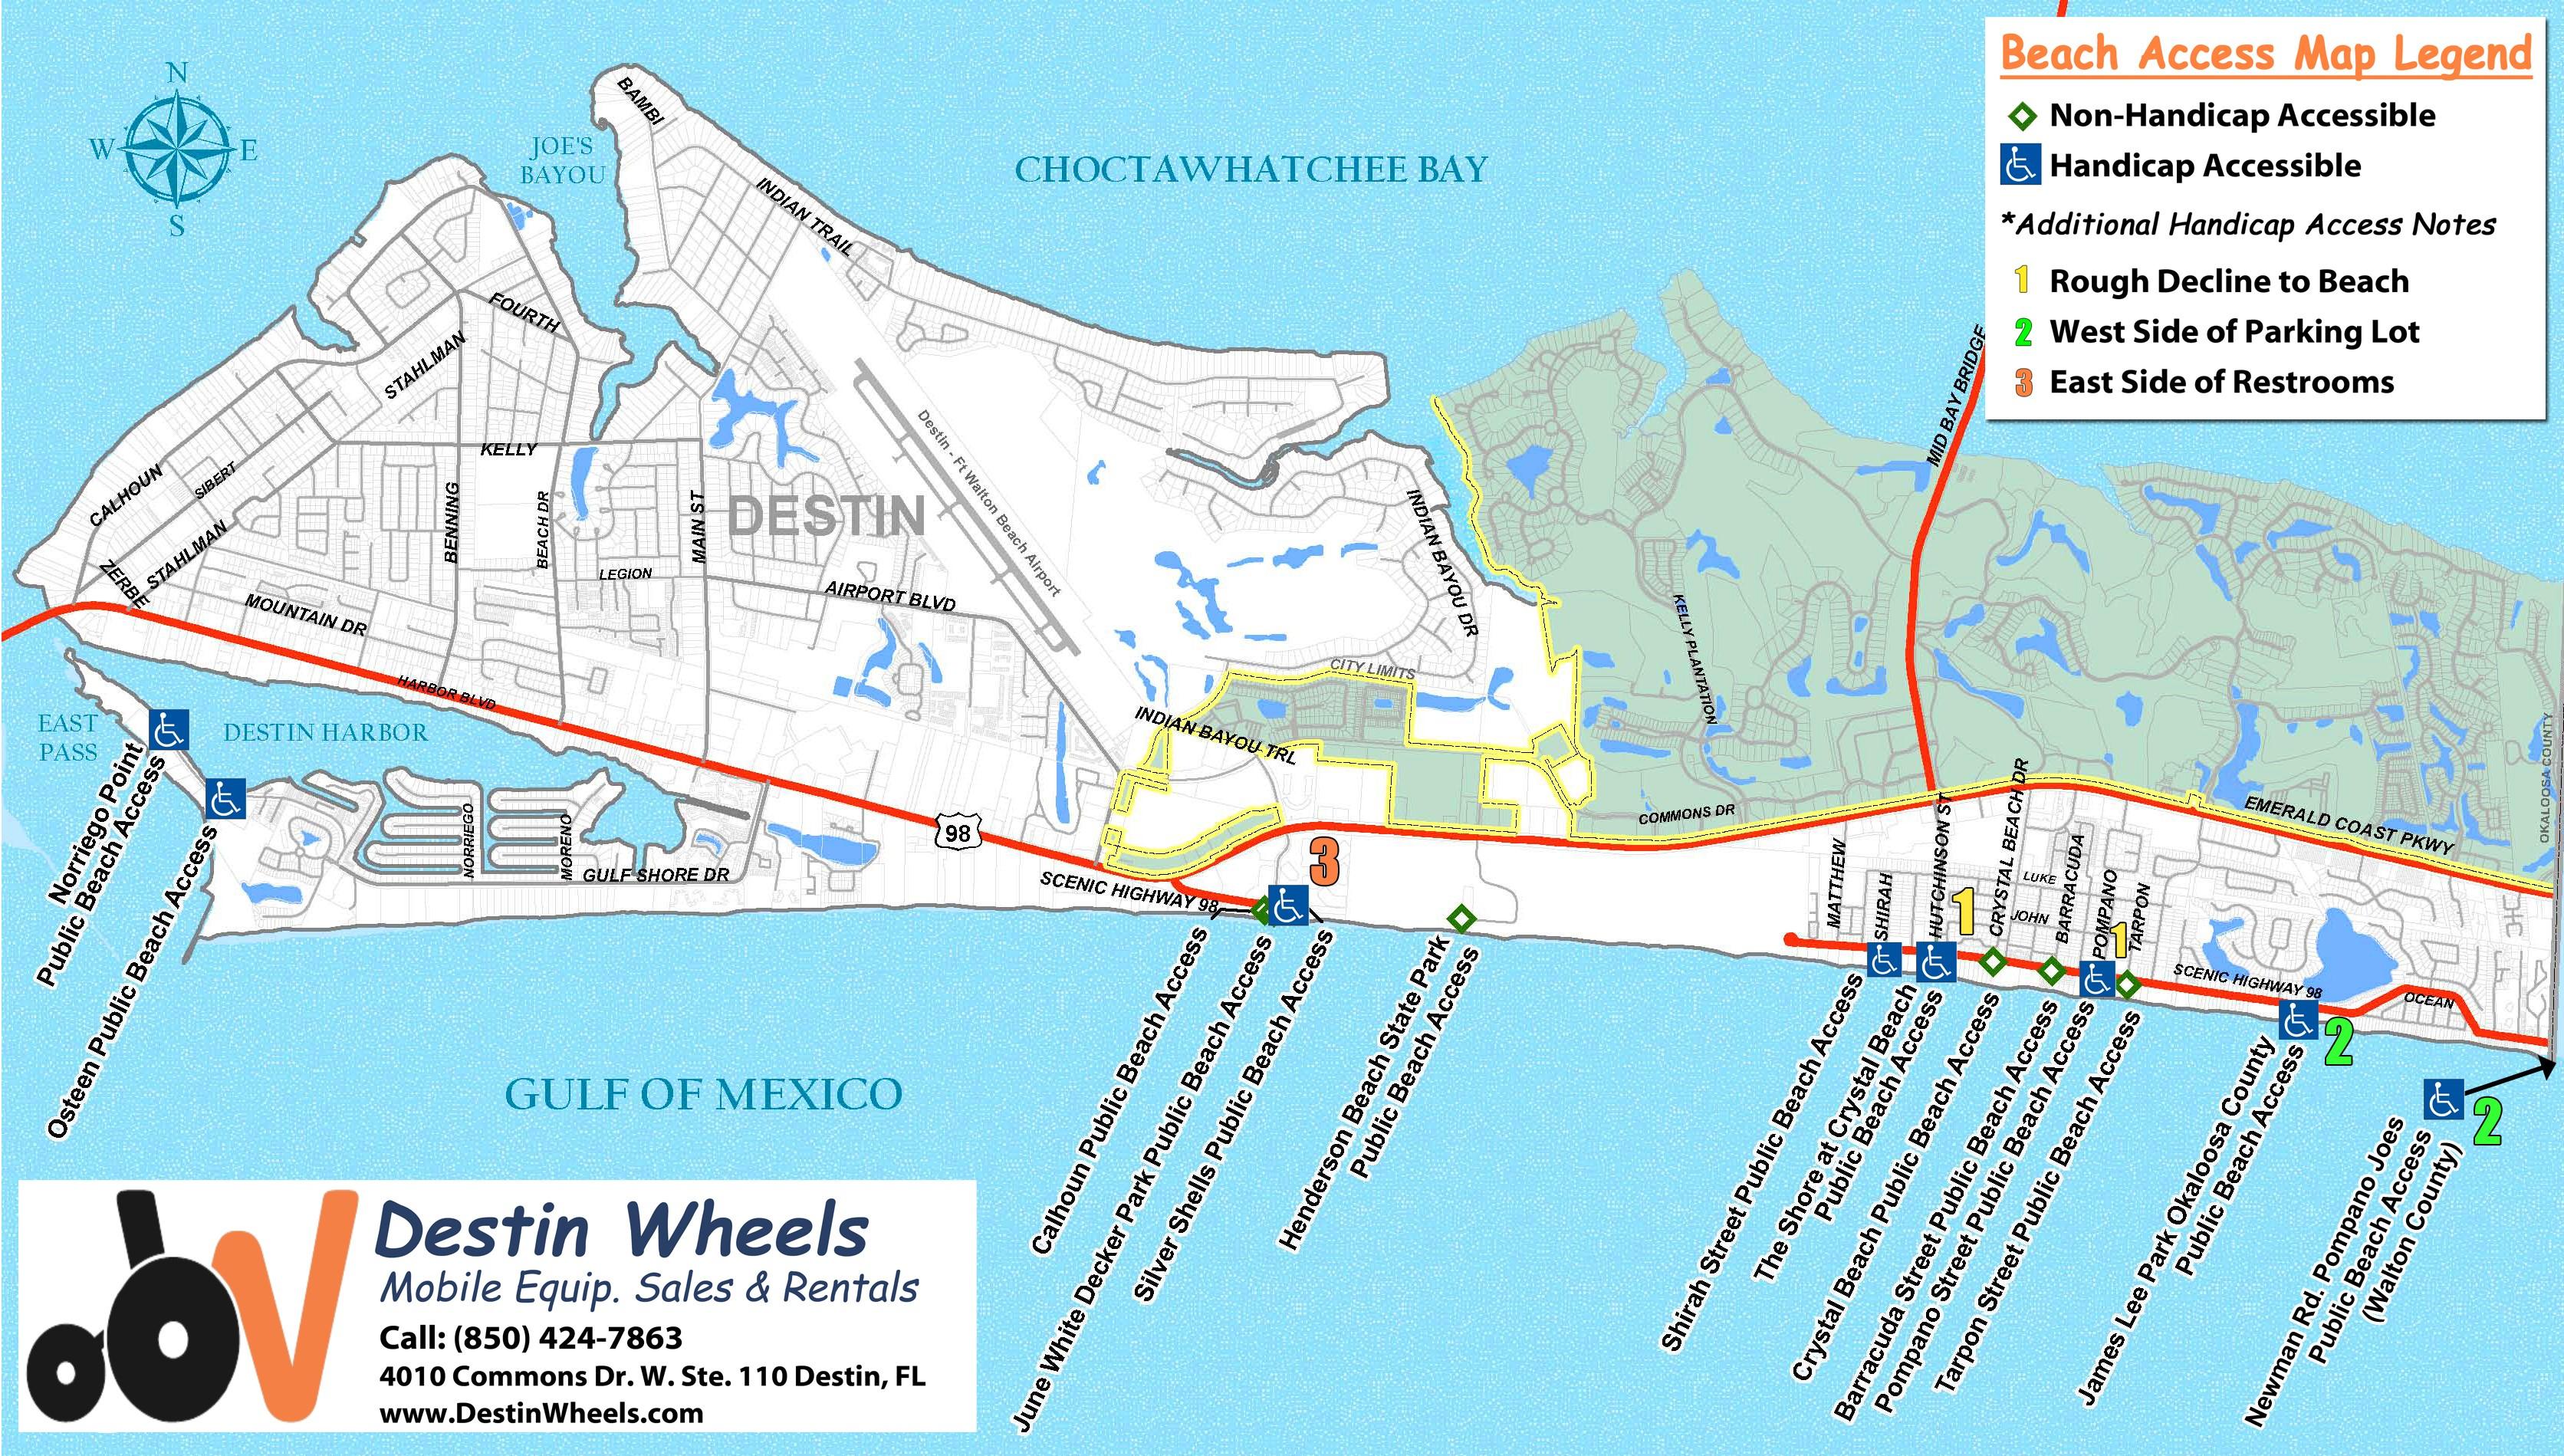 30A & Destin Beach Access - Destin Wheels Rentals In Destin, Fl - Map Of Florida West Coast Beaches